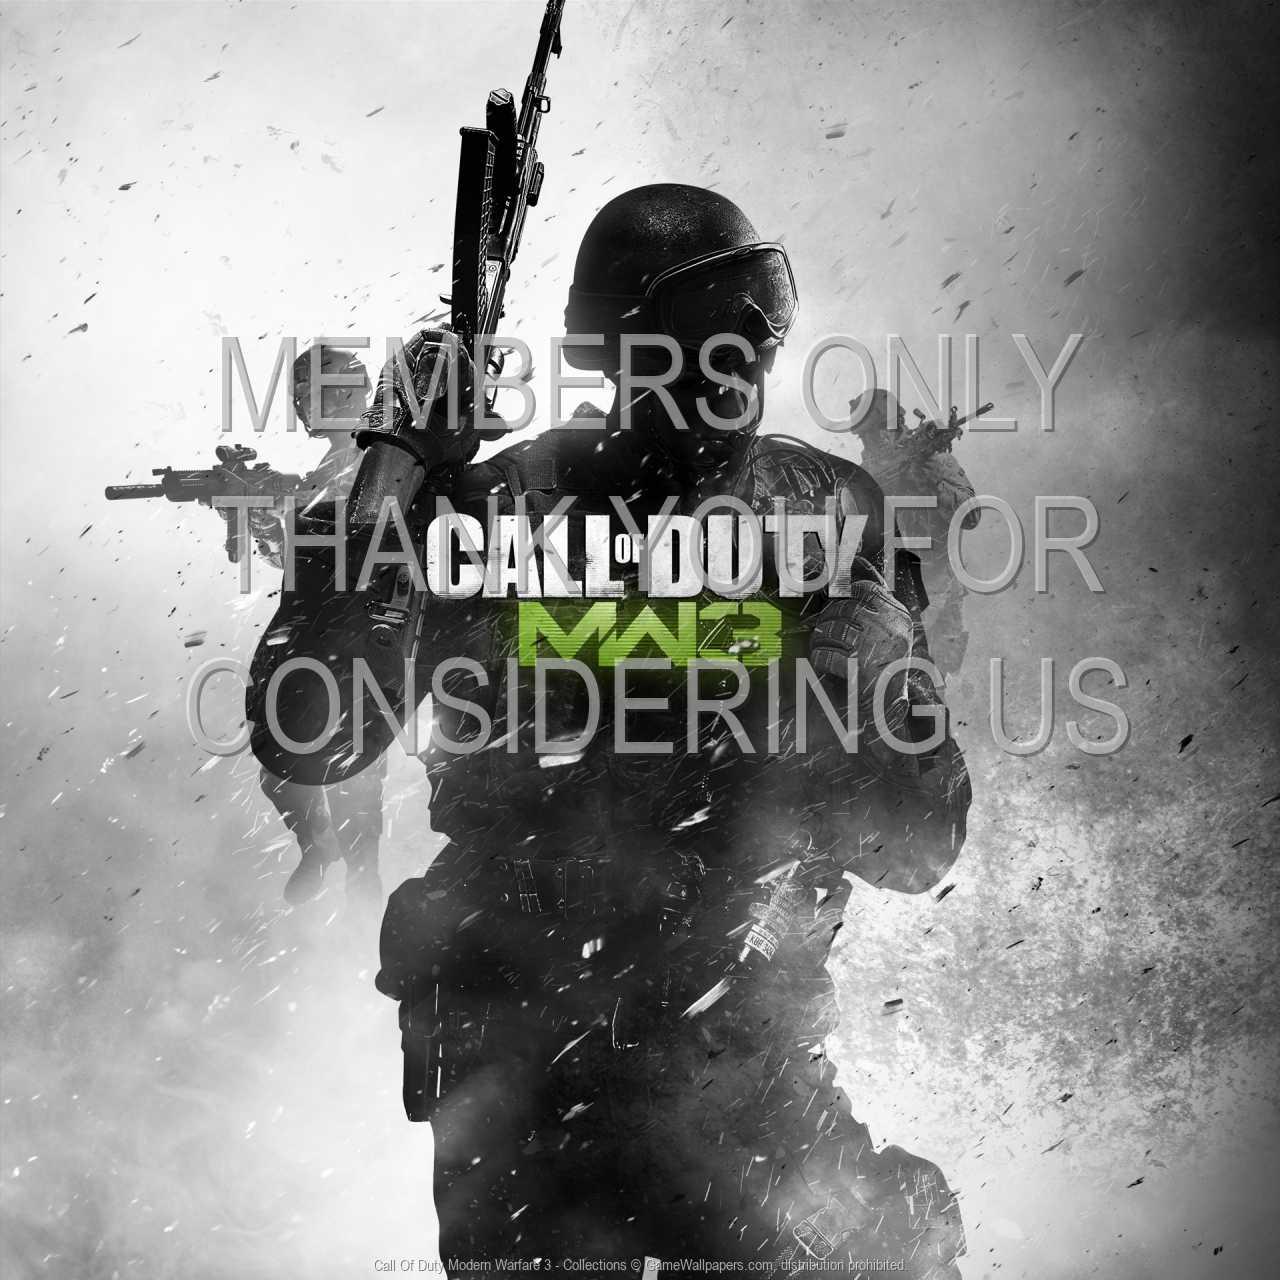 Call Of Duty: Modern Warfare 3 - Collections 720p Horizontal Handy Hintergrundbild 02